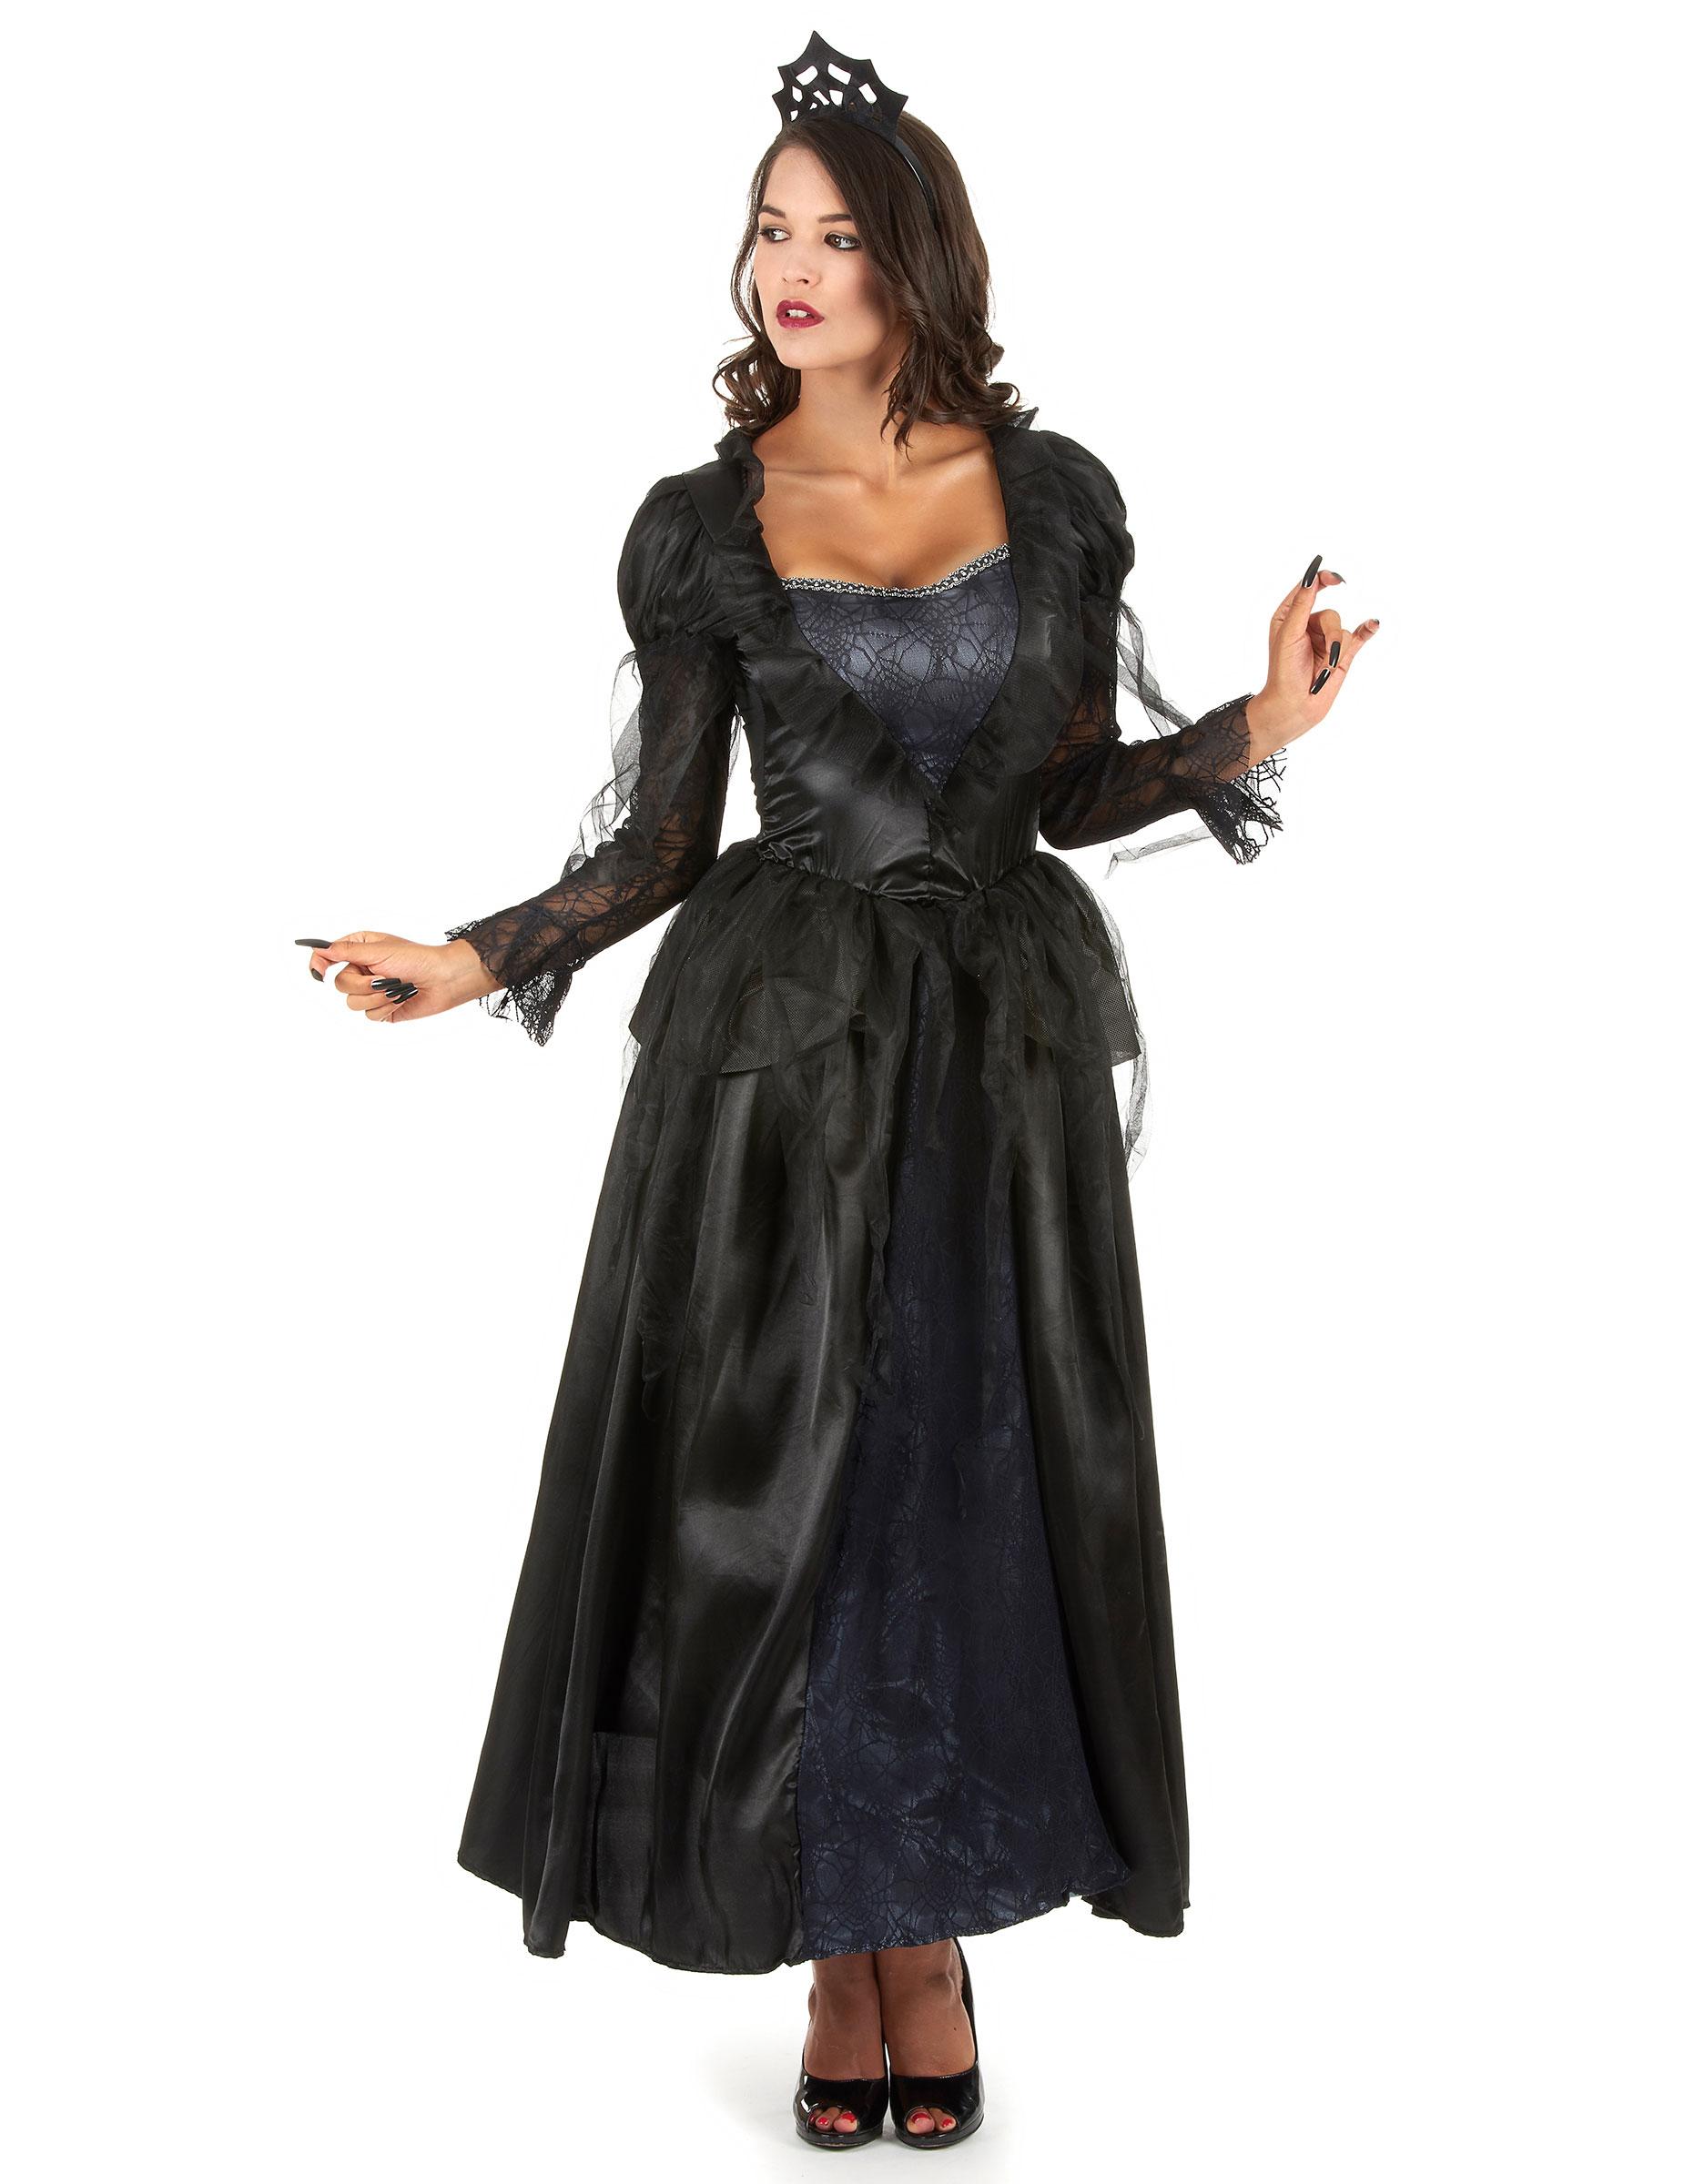 D guisement fant me indienne femme halloween costume ebay - Fabriquer fantome halloween ...